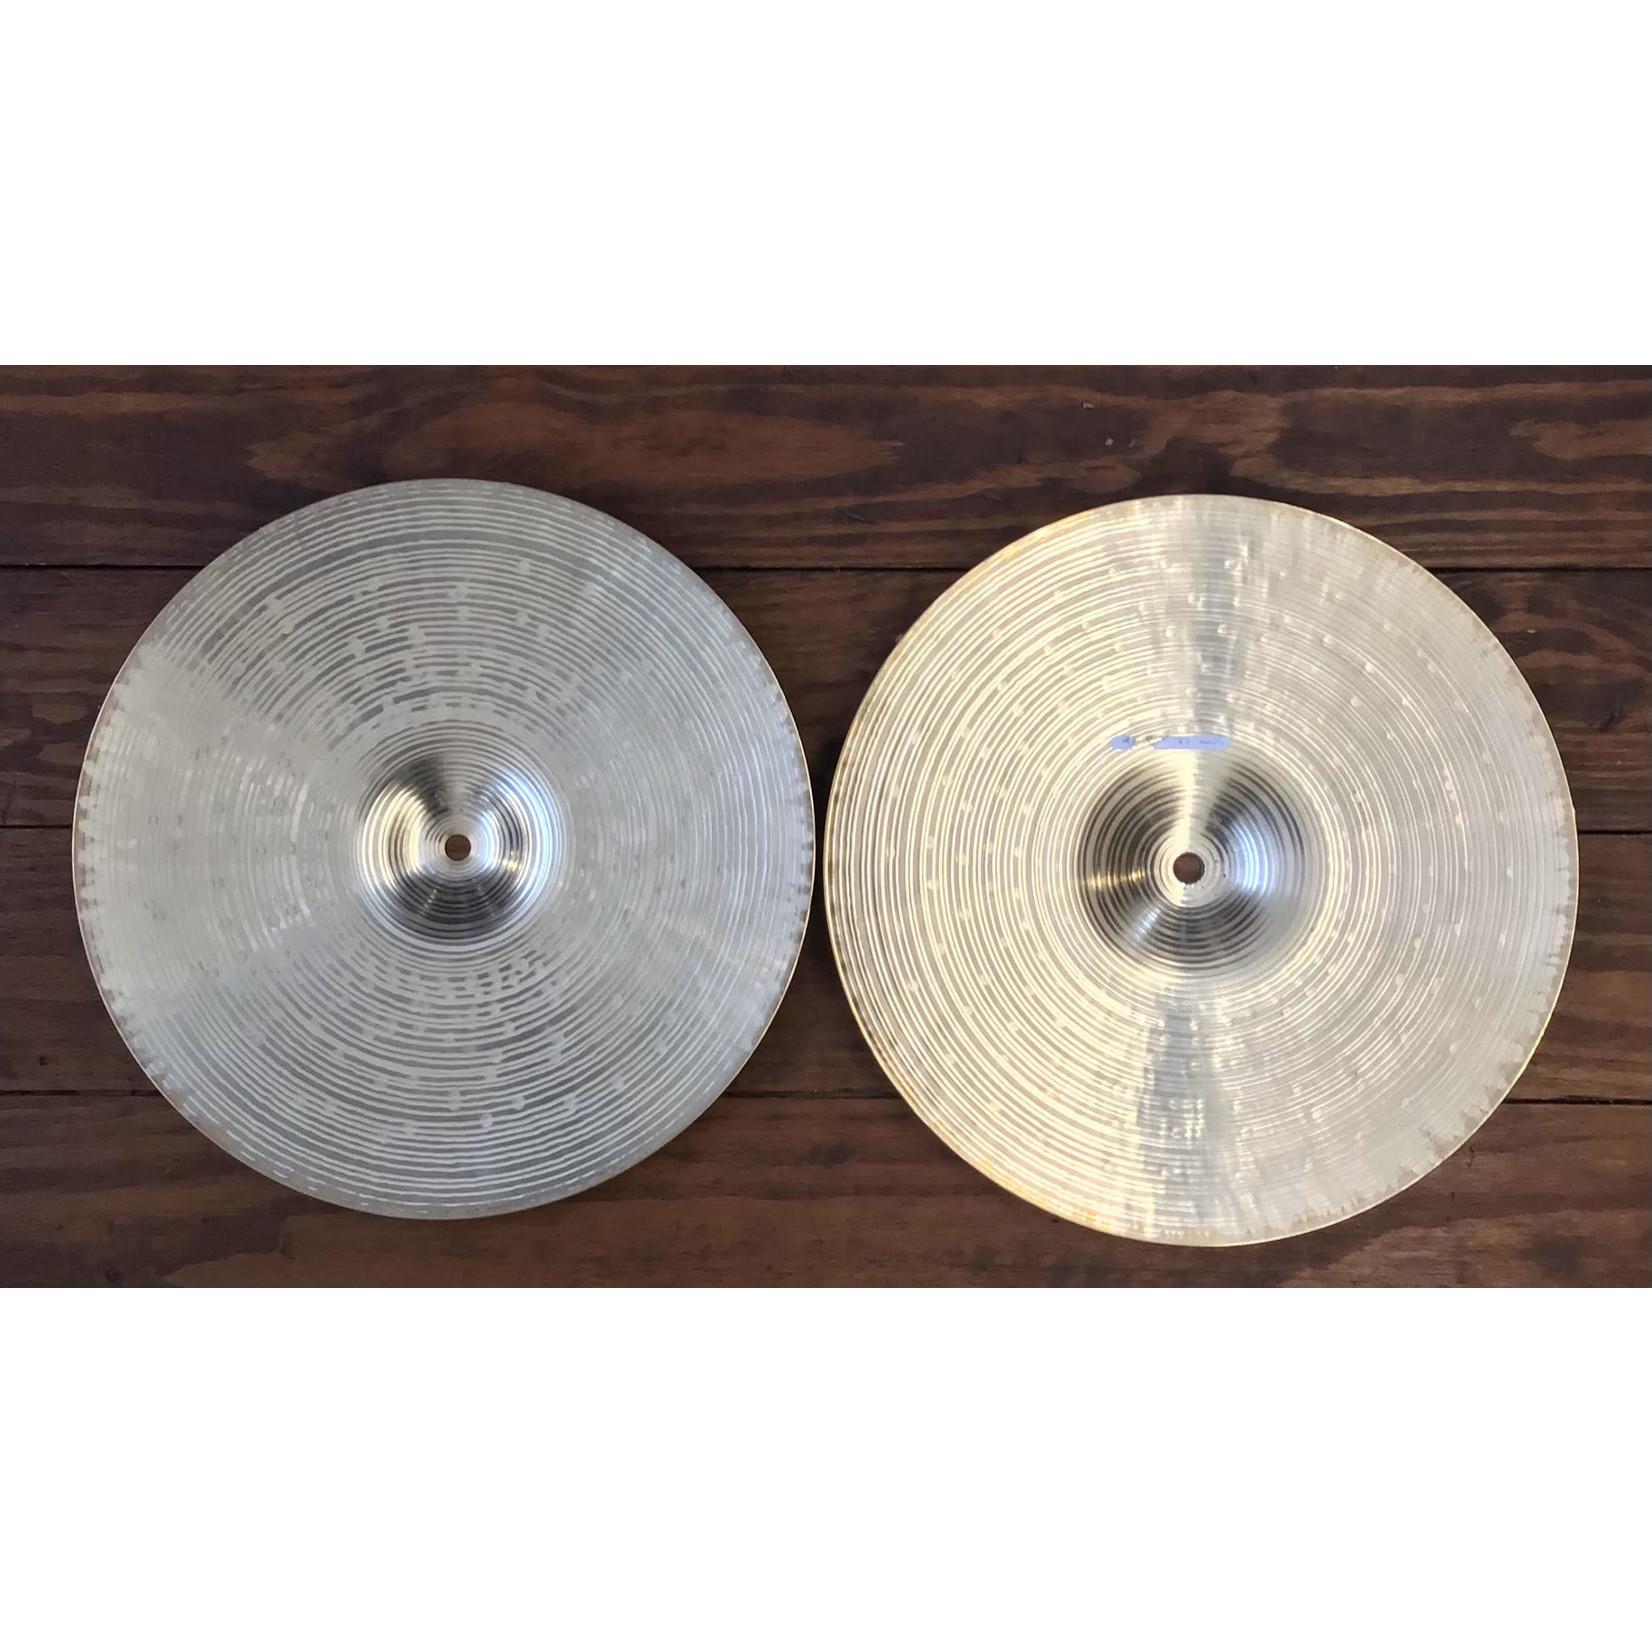 "Paiste USED Paiste Twenty 14"" Hi-Hat Cymbals (Pair)"